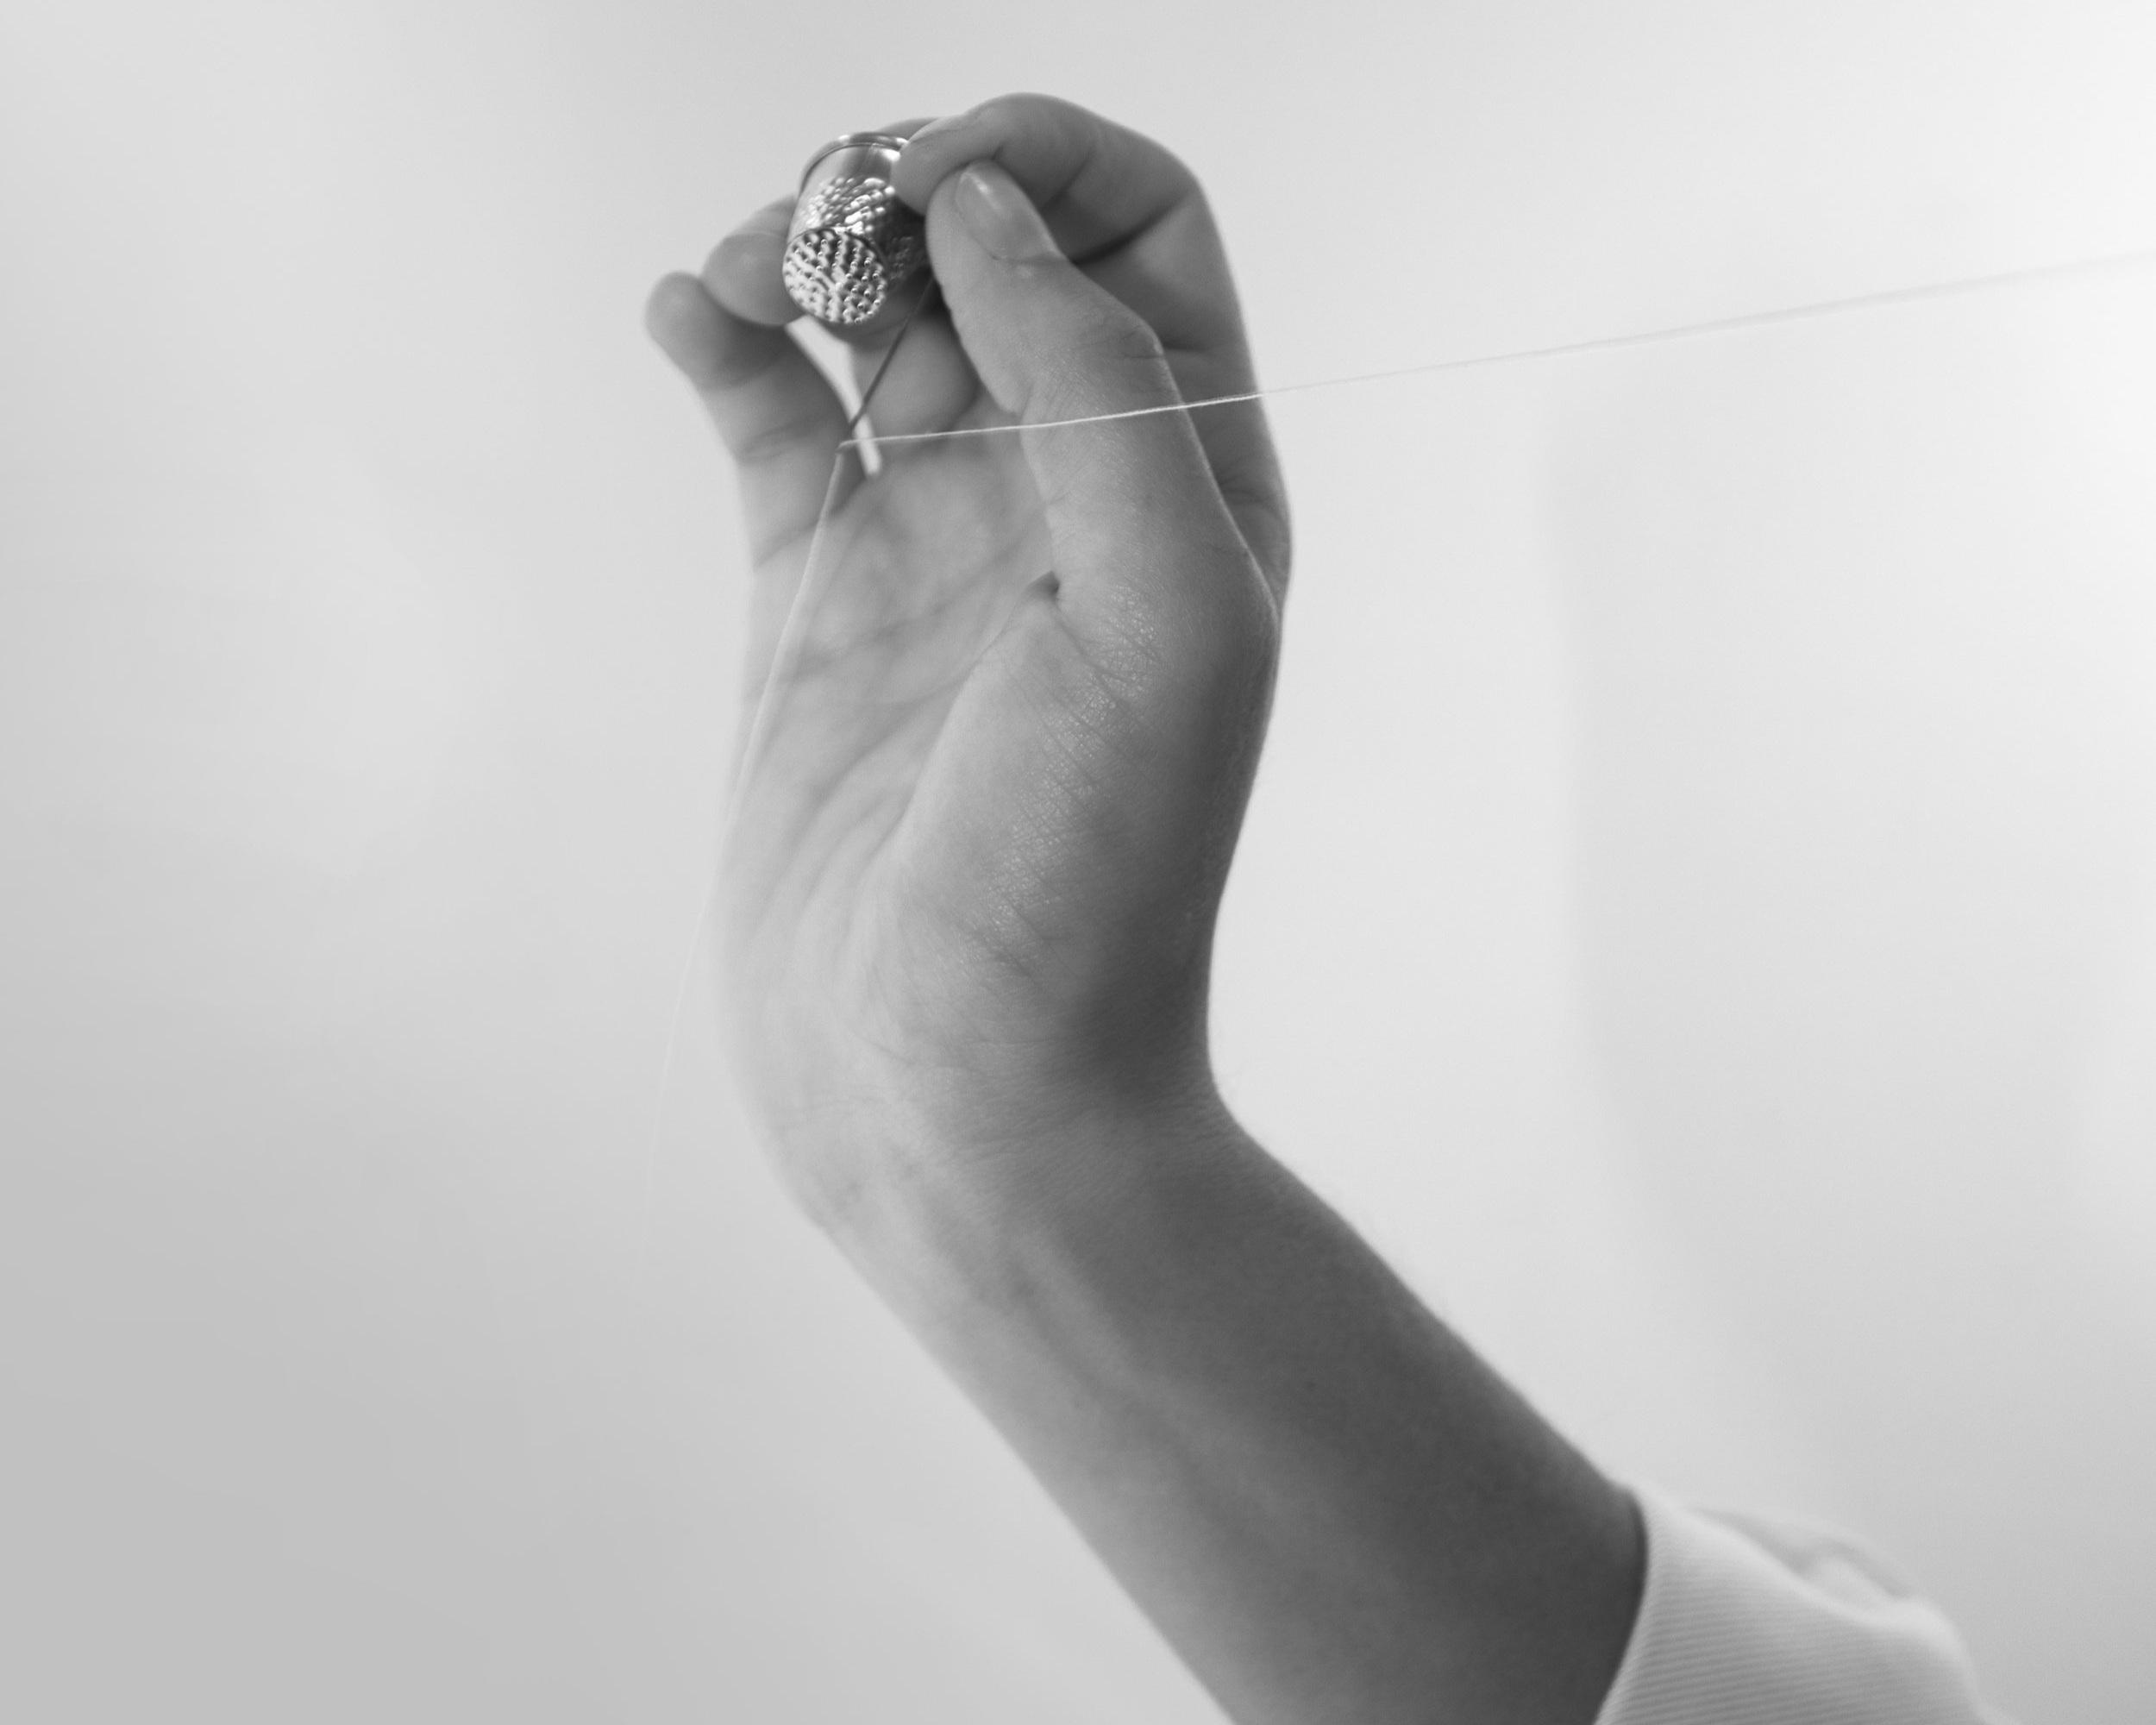 Womens_Sewing_Hand.jpg